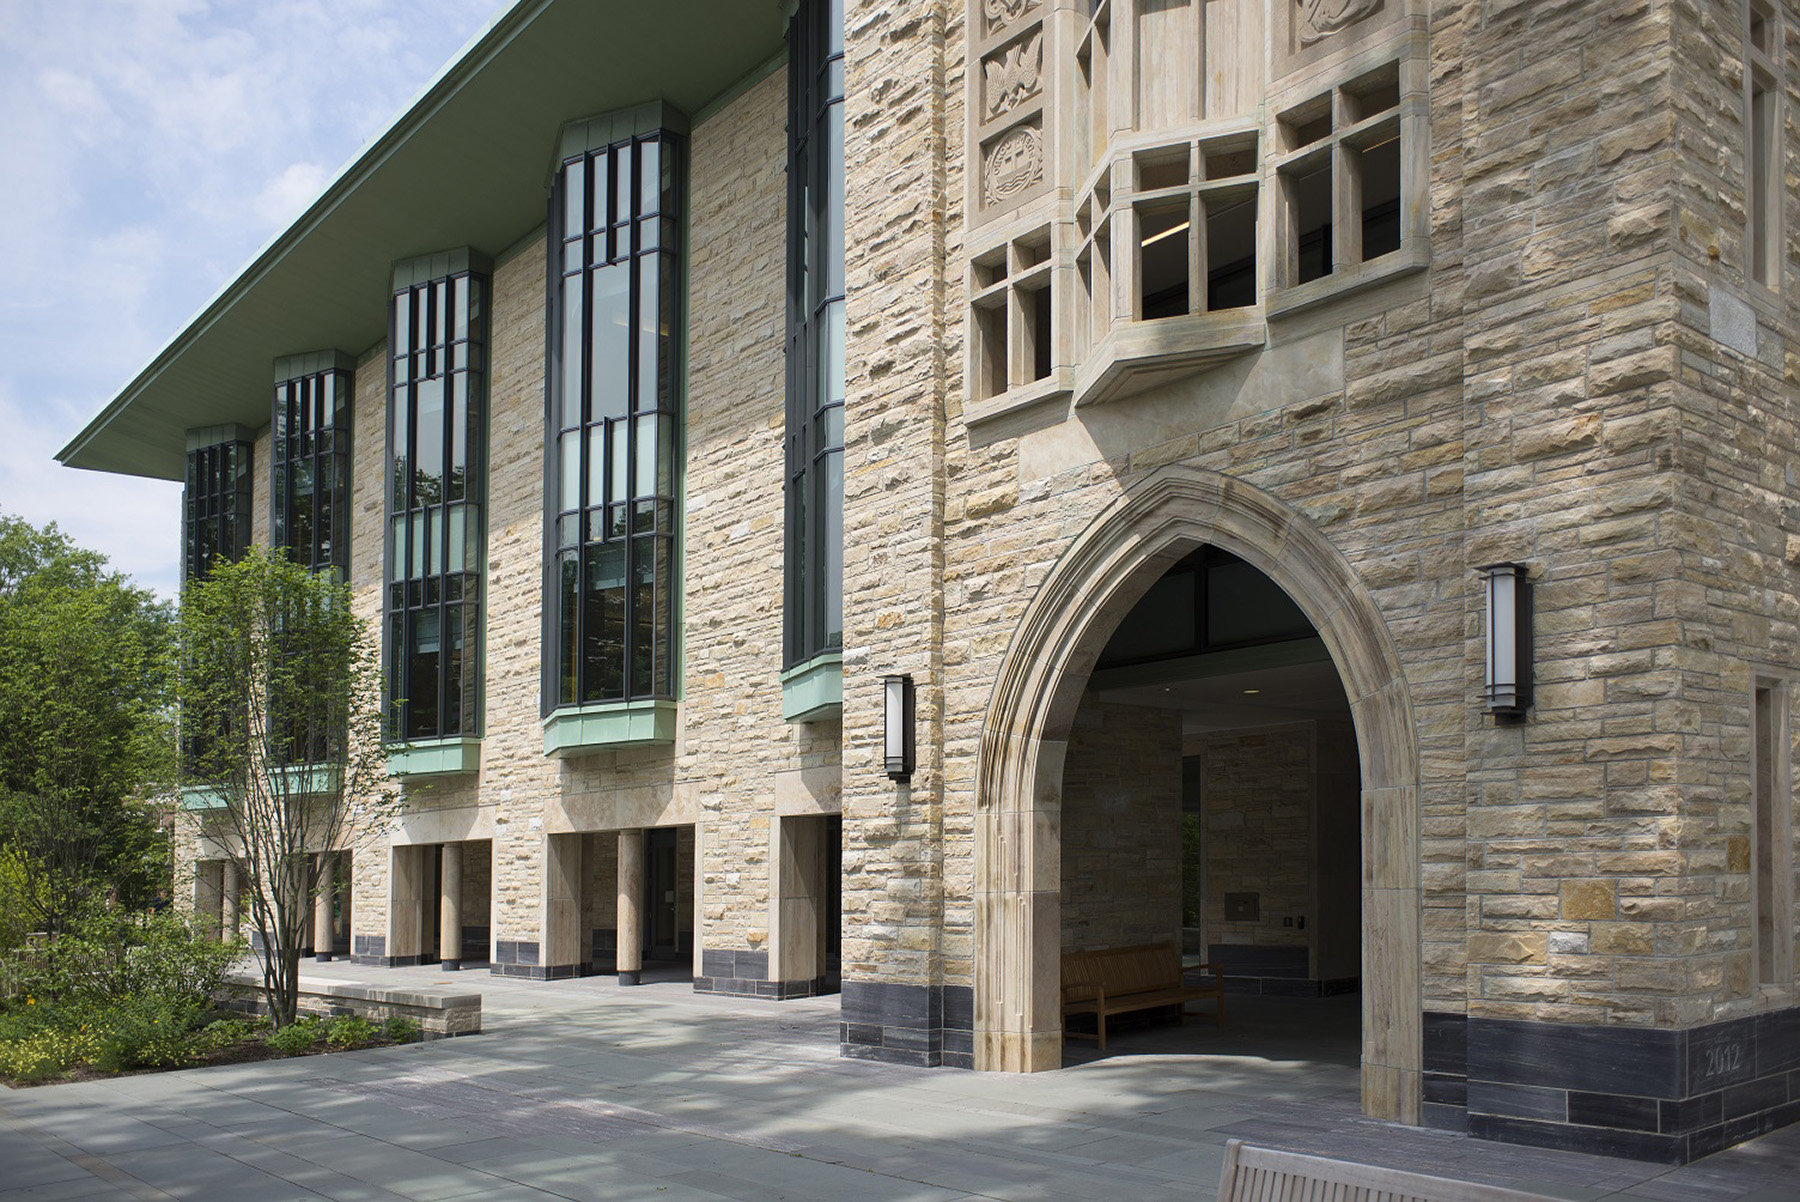 princeton building entrance